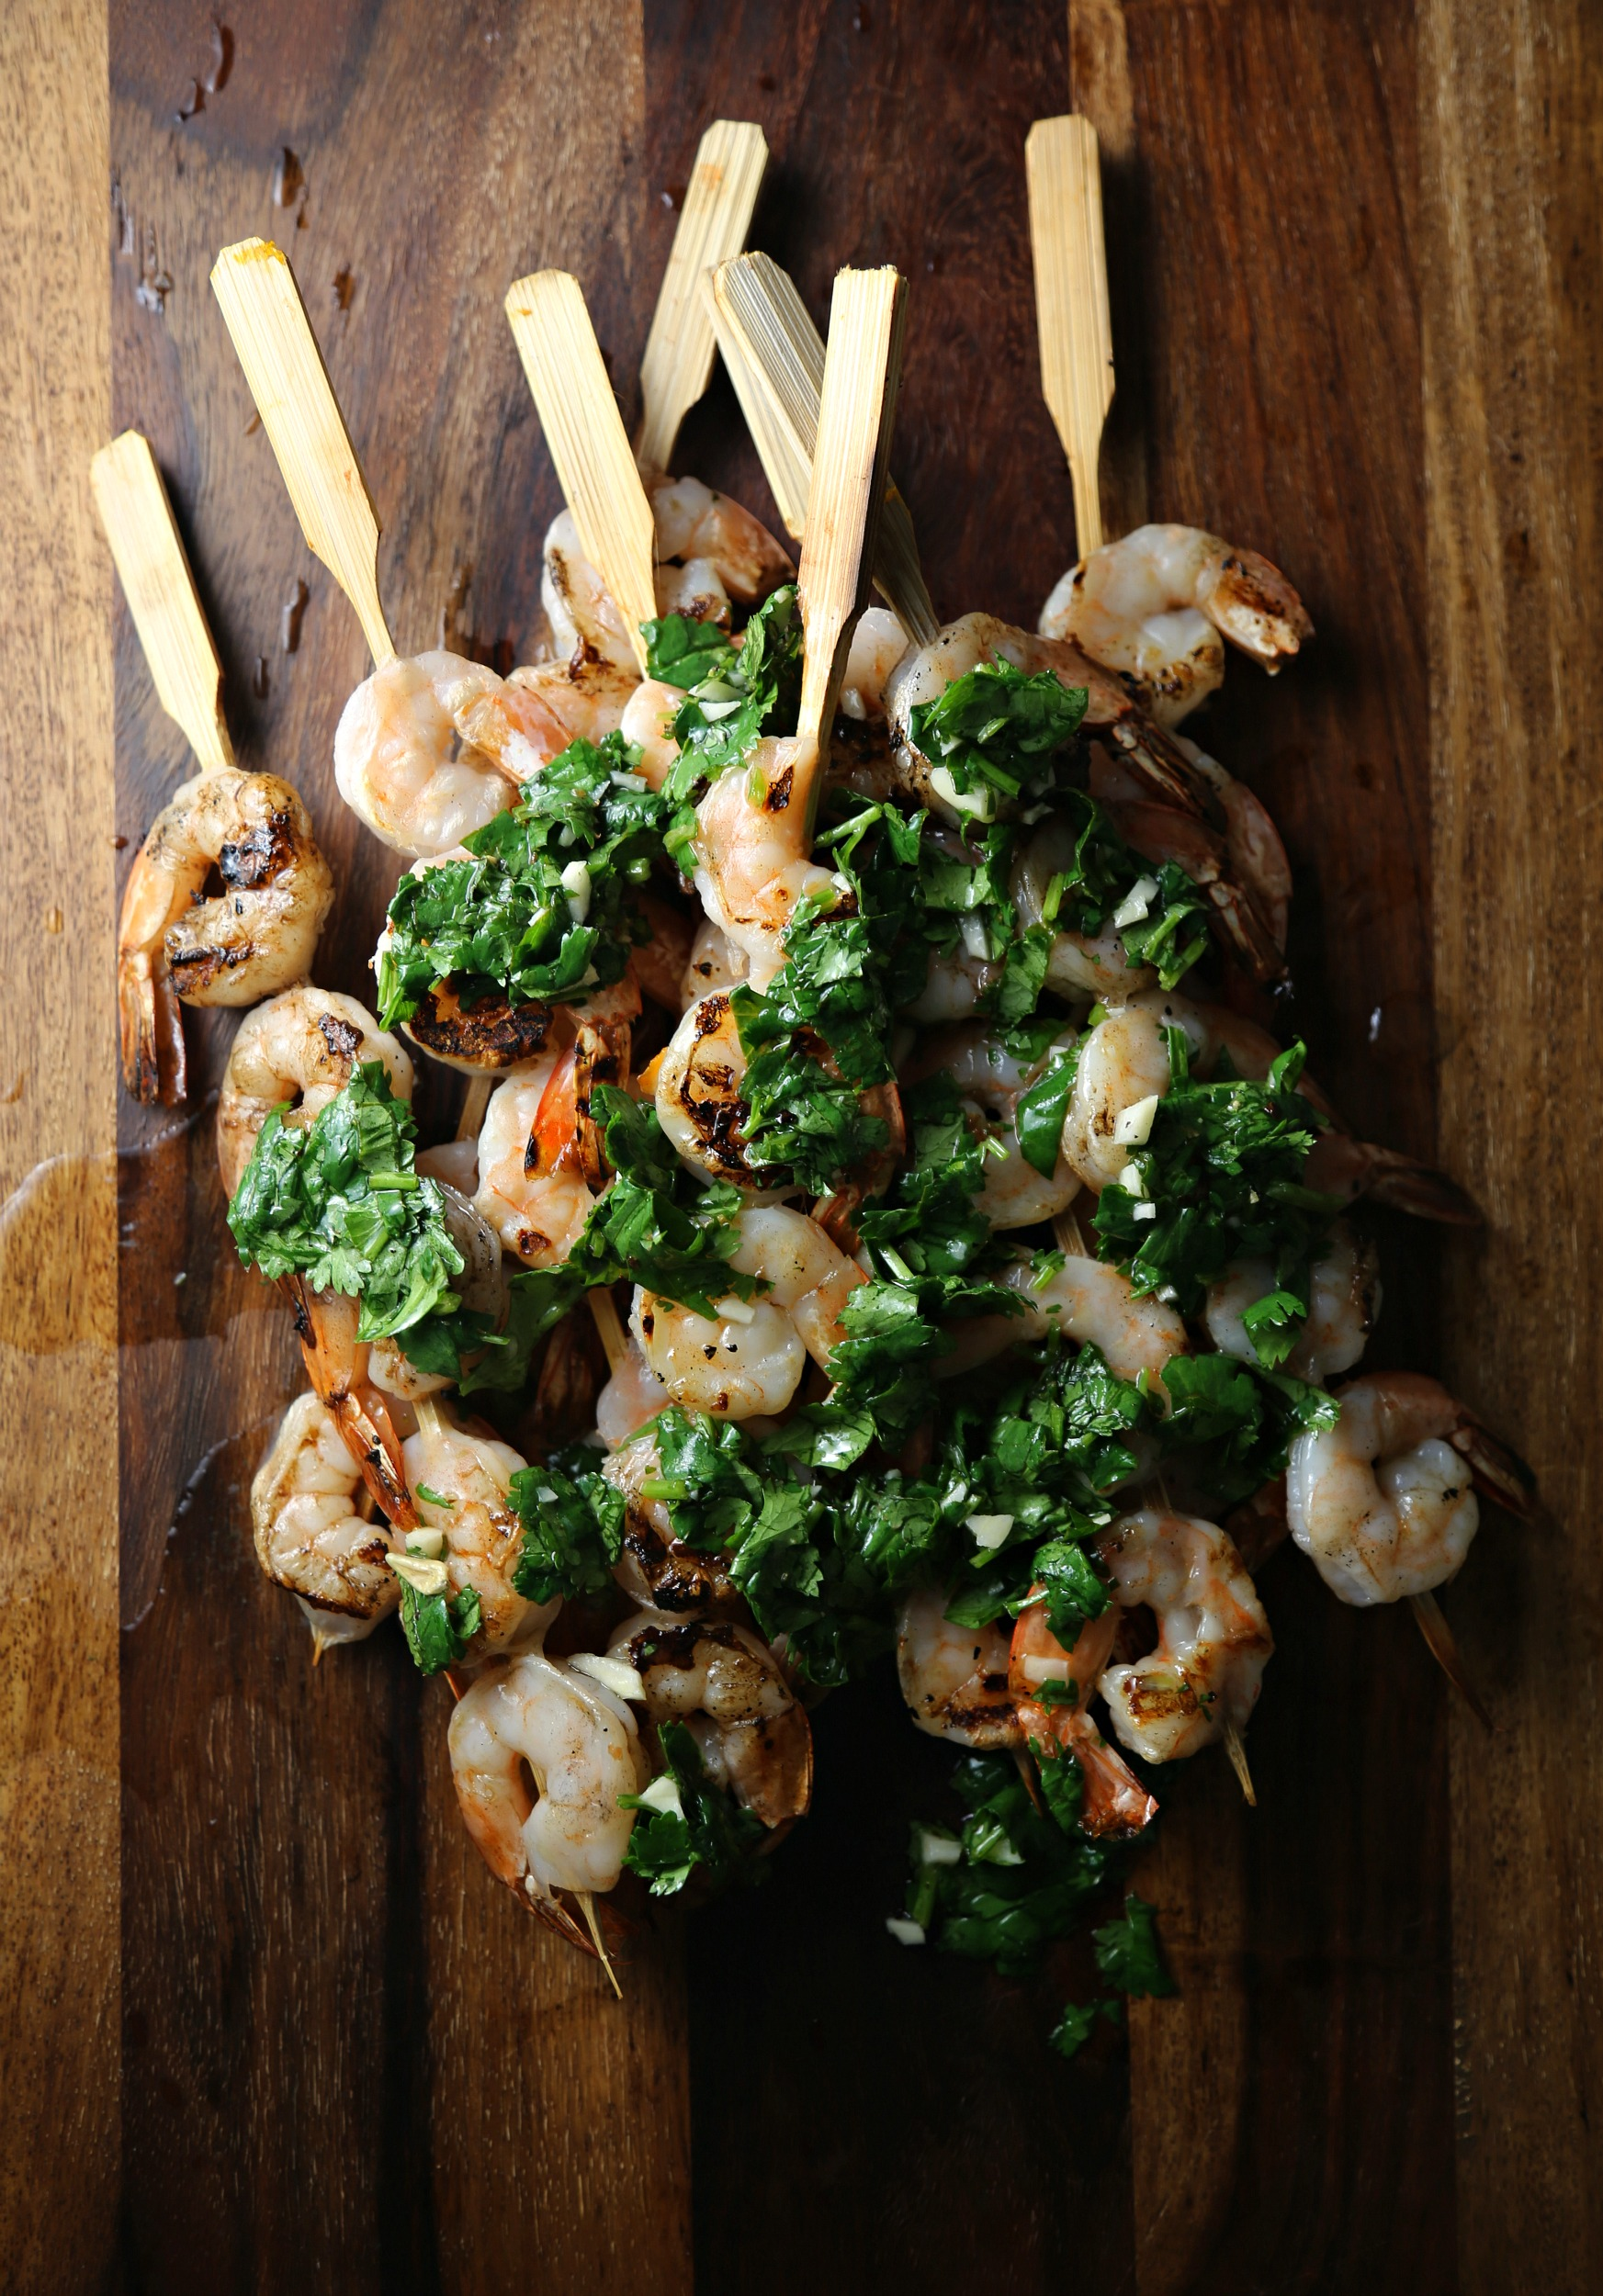 Grilled Shrimp with Cilantro-Lemon Salsa VerdeSweet Life